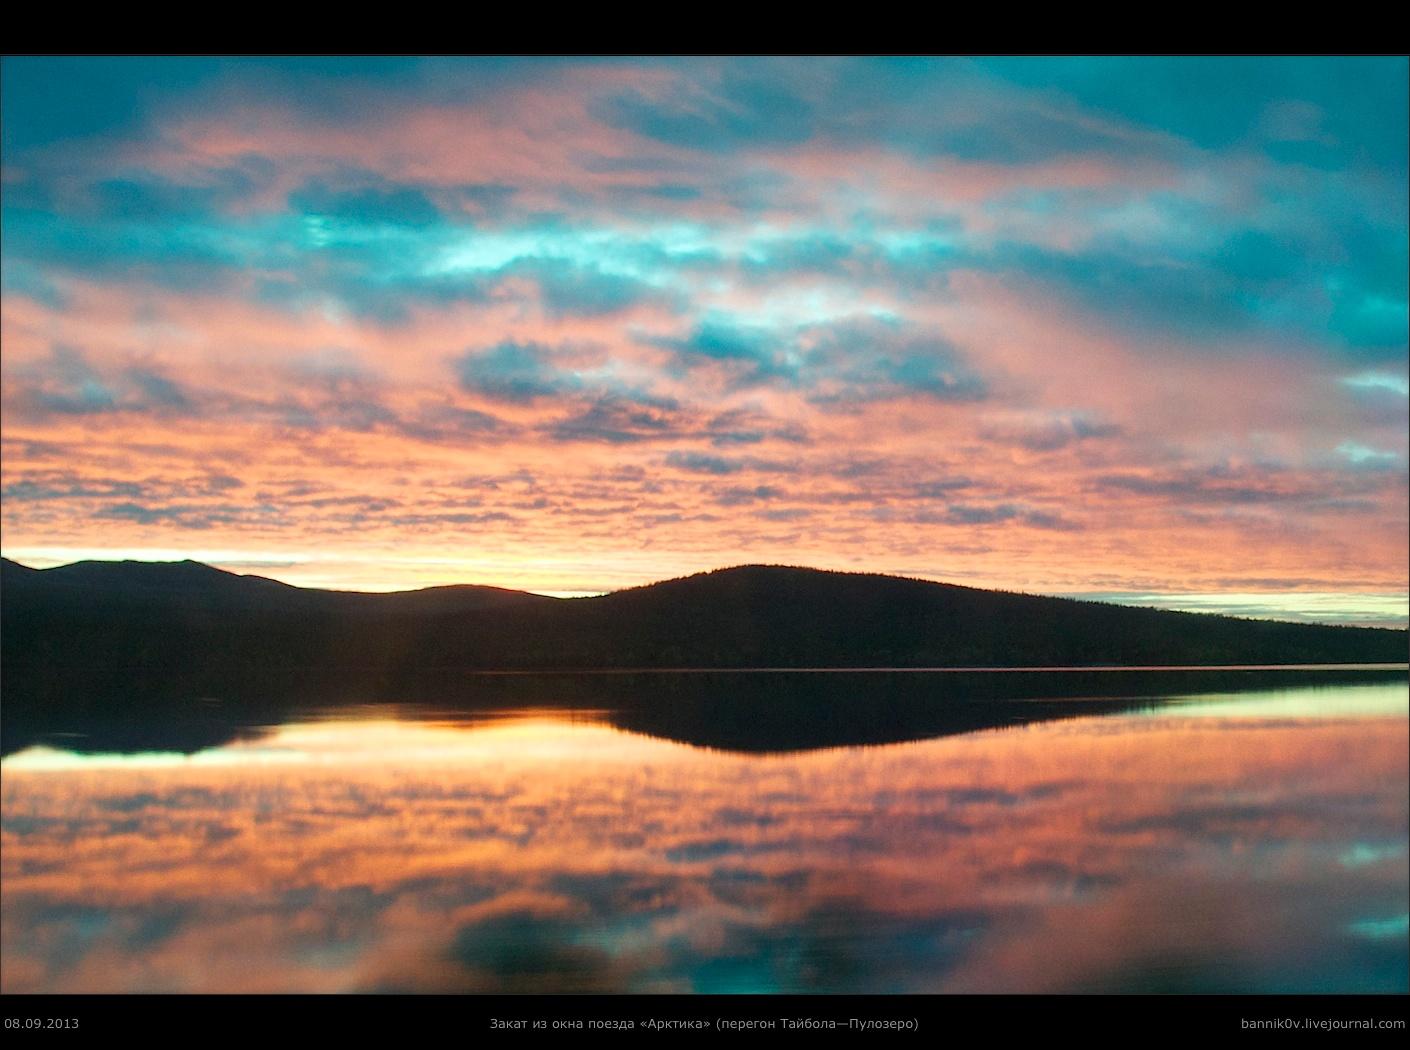 Закат из окна «Арктики» на перегоне Тайбола—Пулозеро 08.09.13 по дороге на ст. Волховстрой.